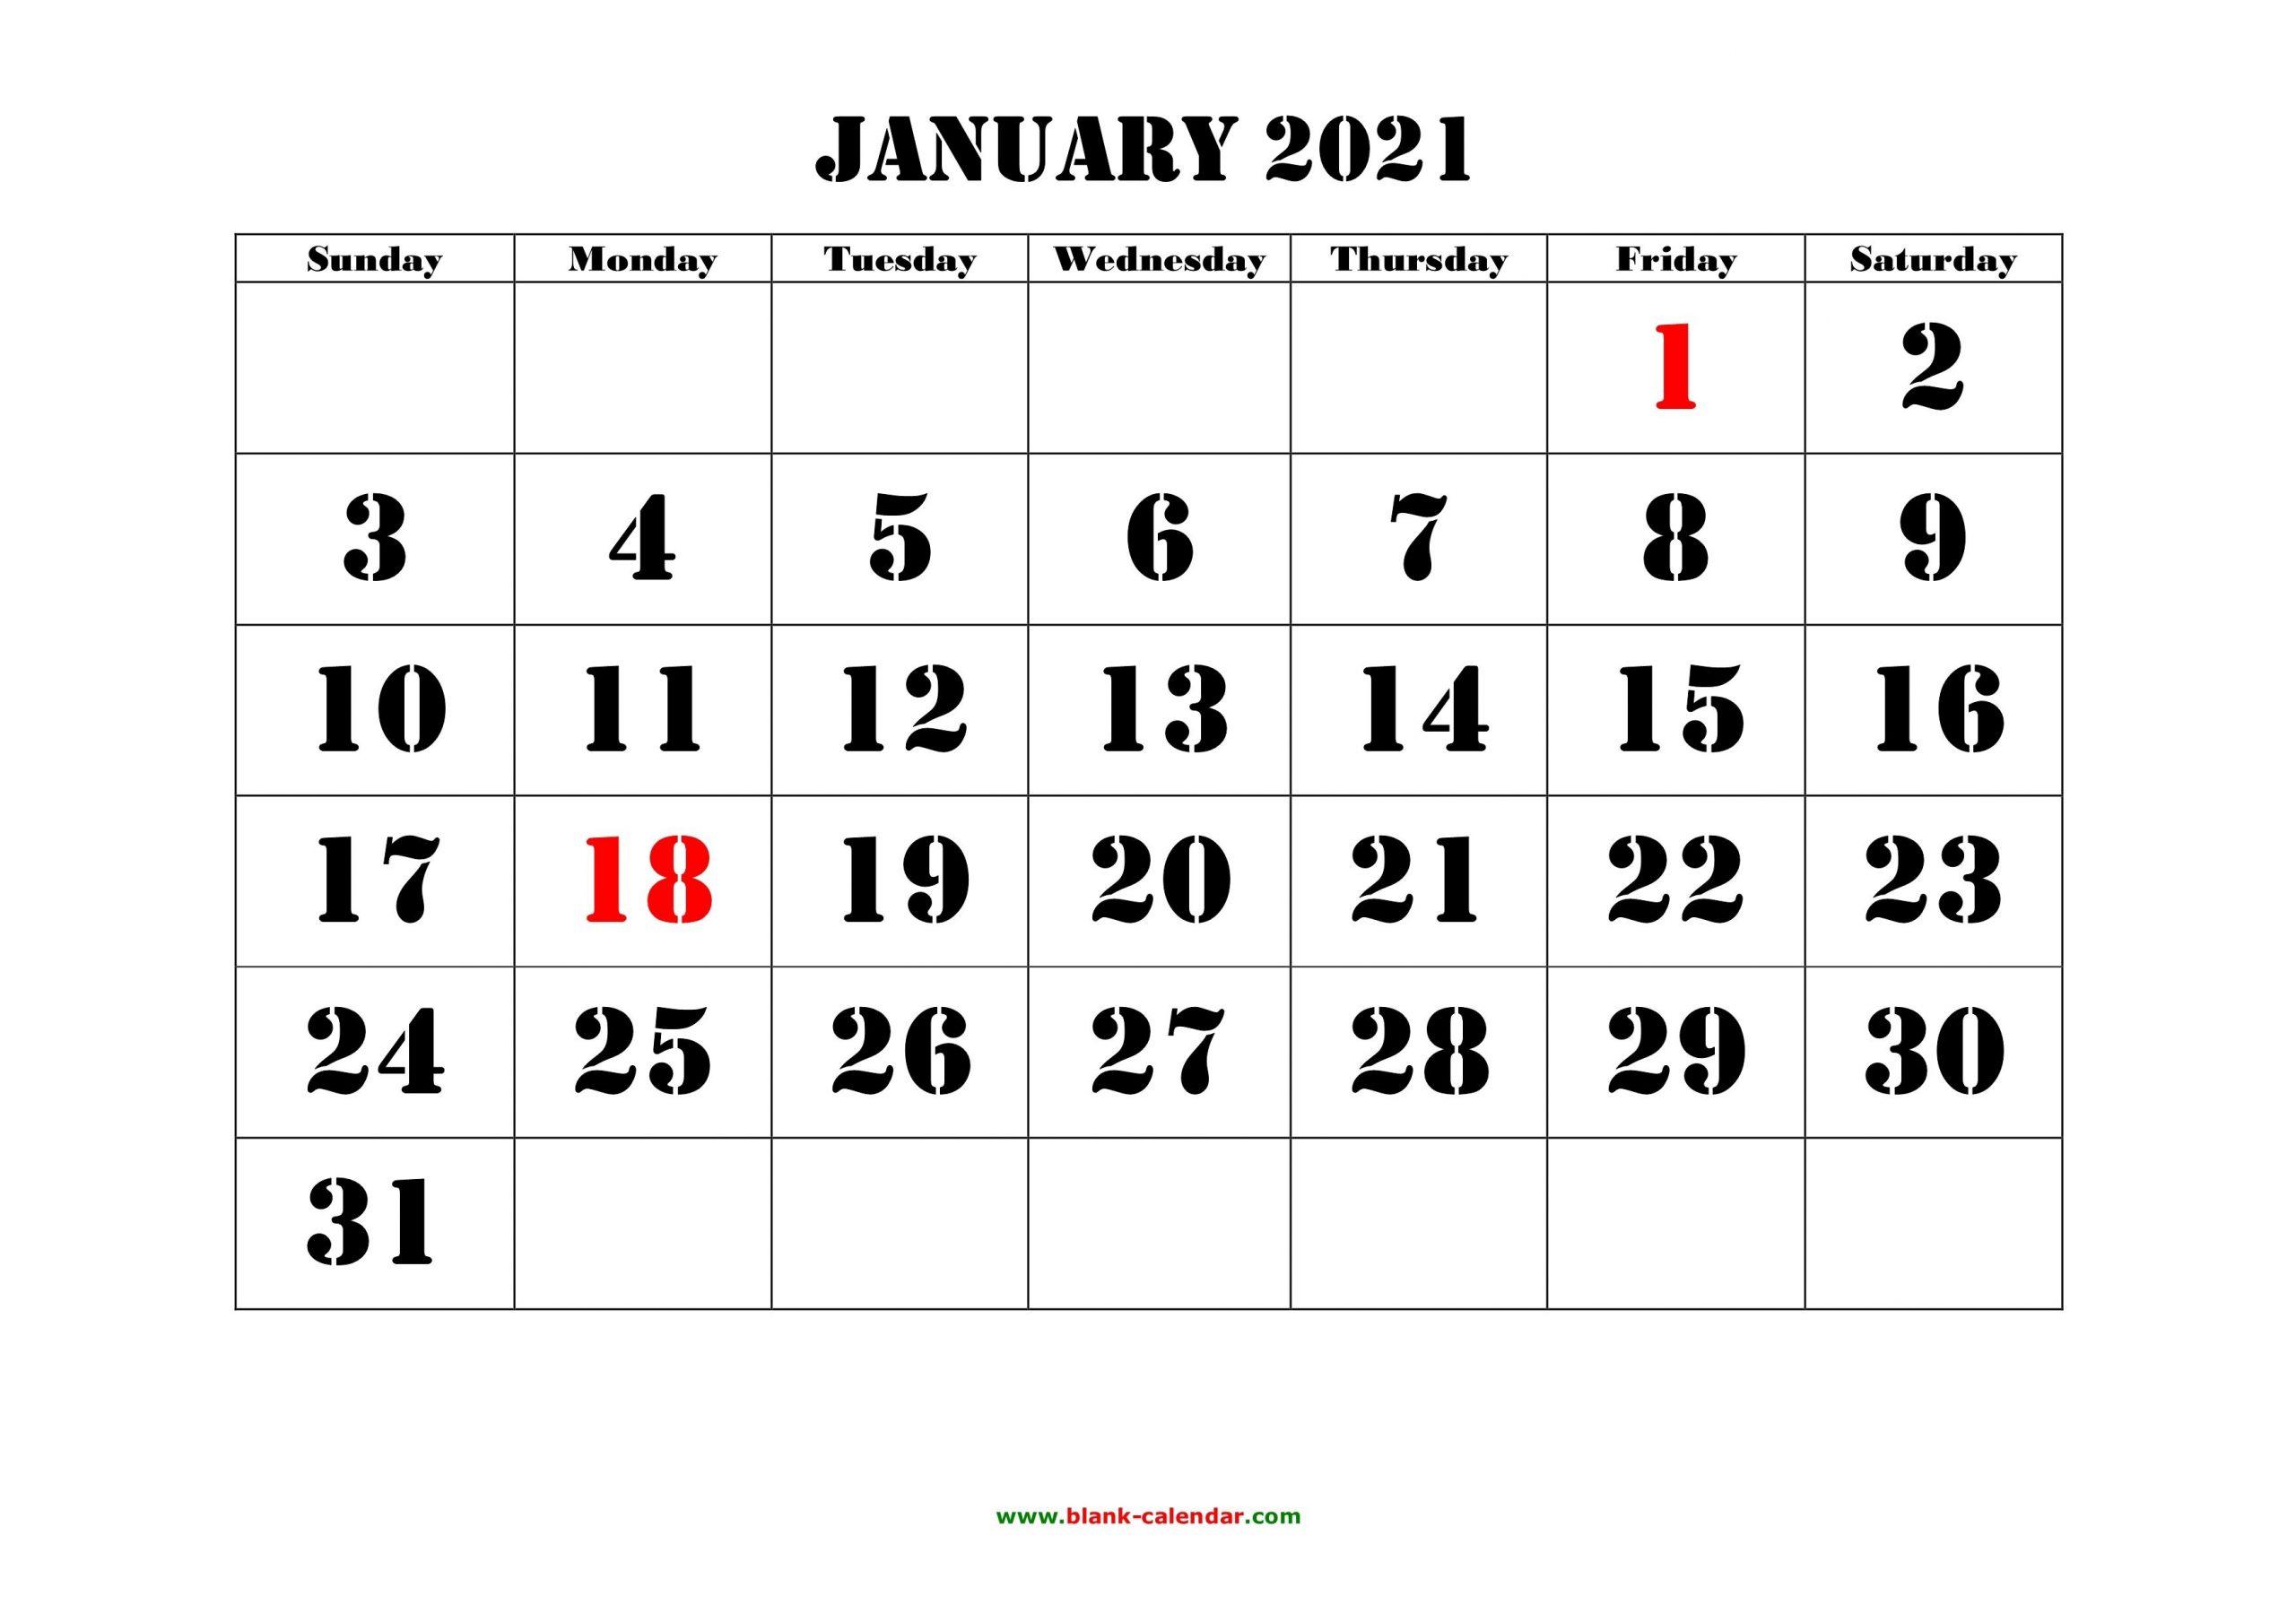 Calendar Grid January 2021 | Printable March